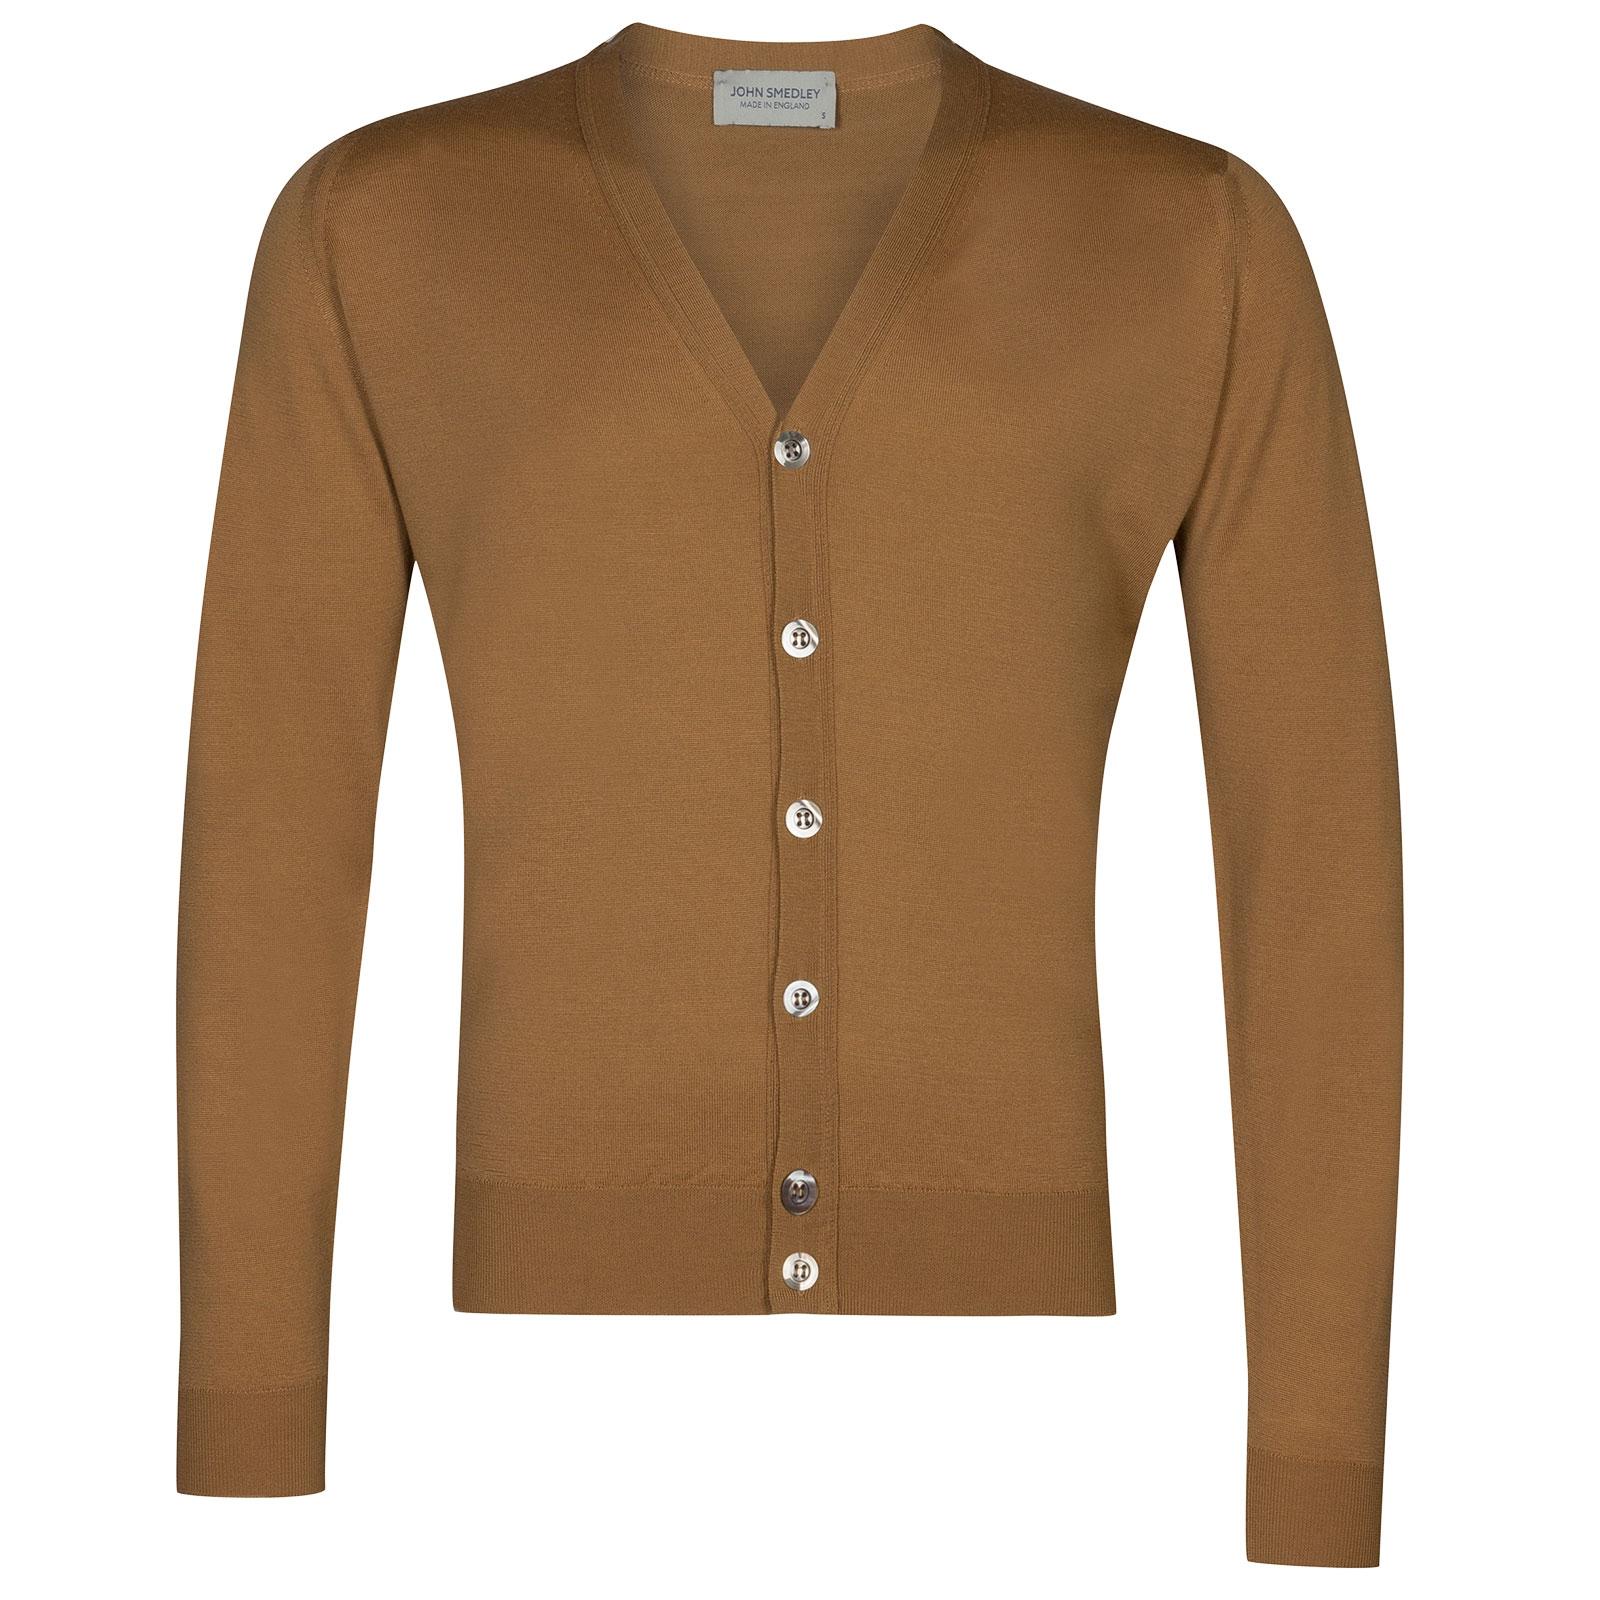 John Smedley Naples Merino Wool Cardigan in Camel-XL